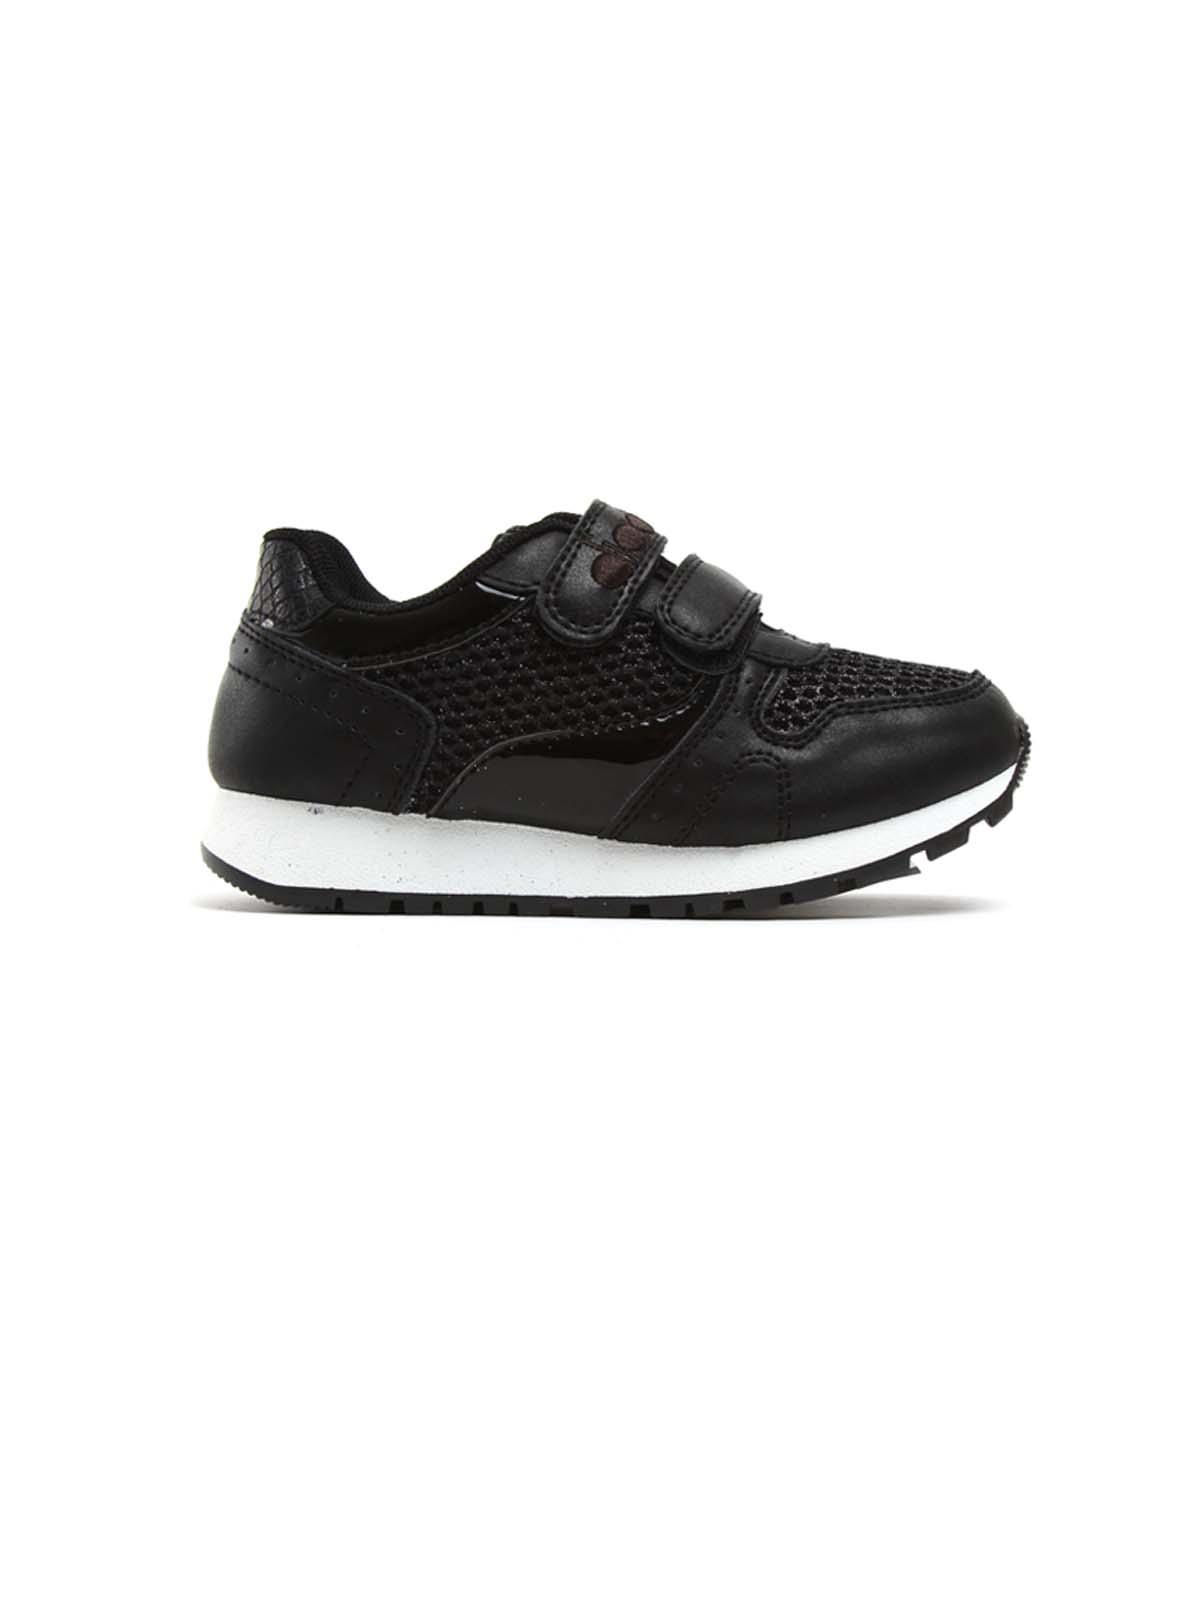 Adidas ילדות // אמי ולק. שחורות